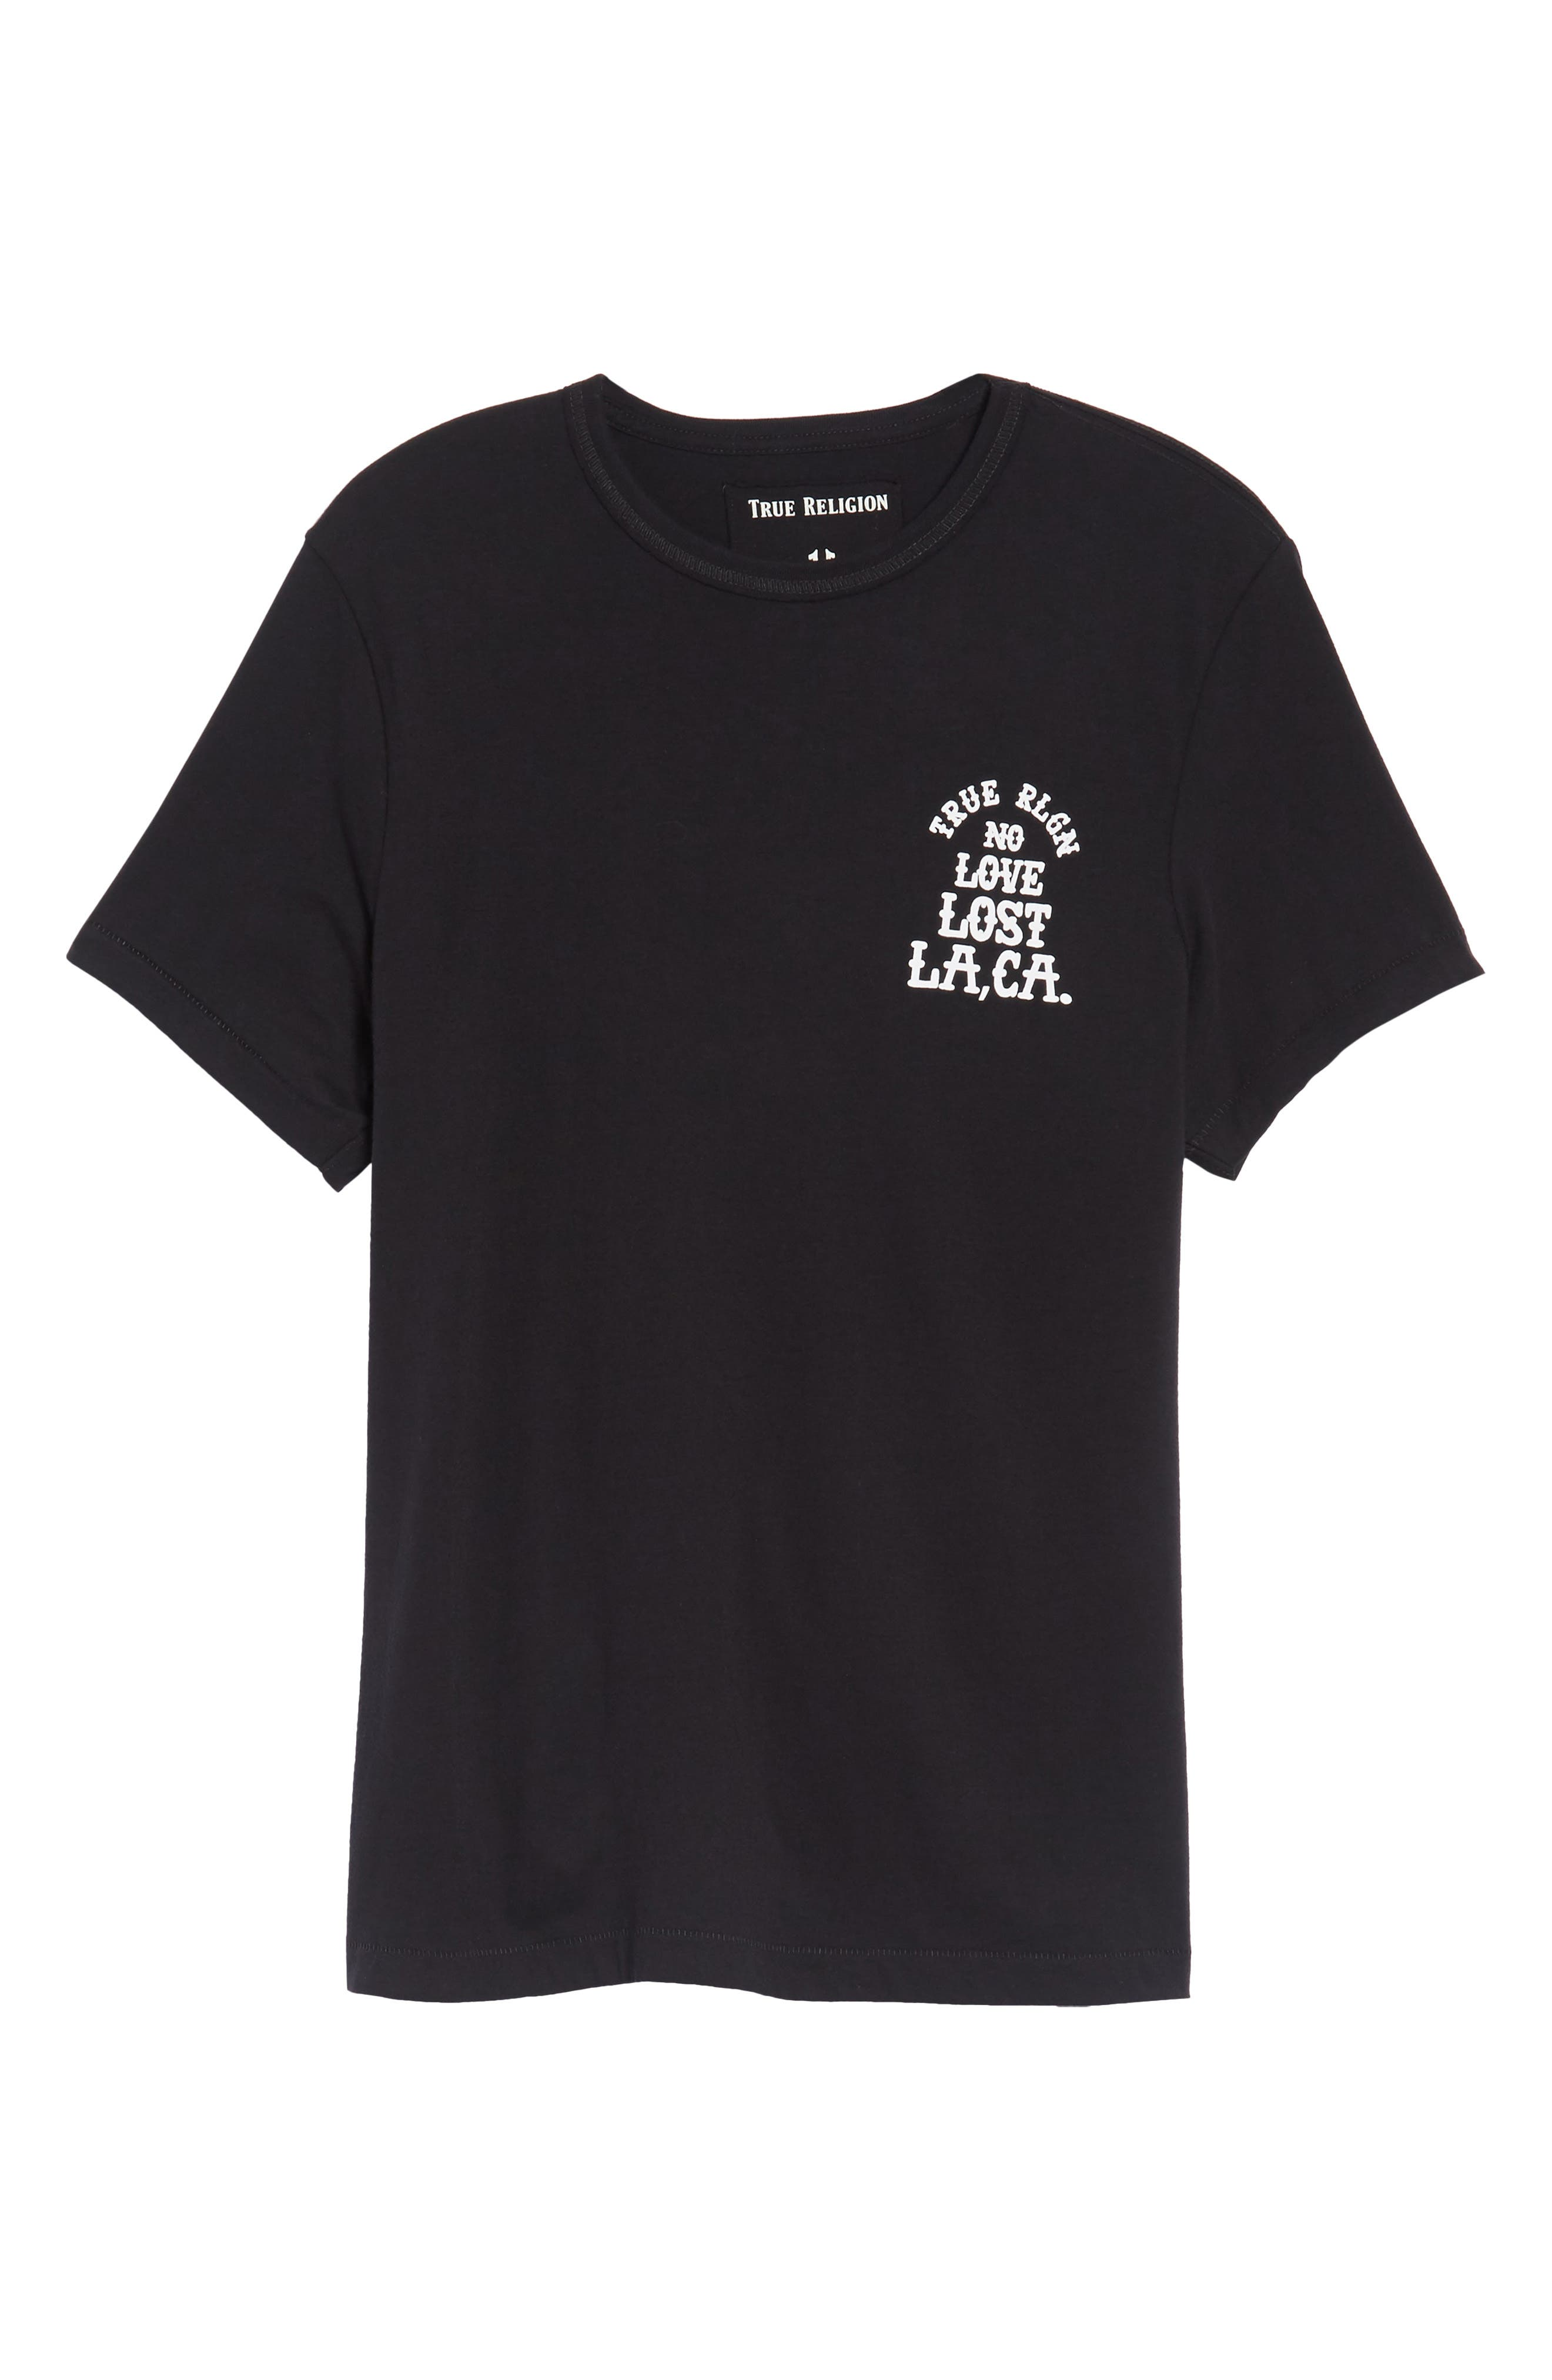 No Love Lost T-Shirt,                             Alternate thumbnail 6, color,                             001